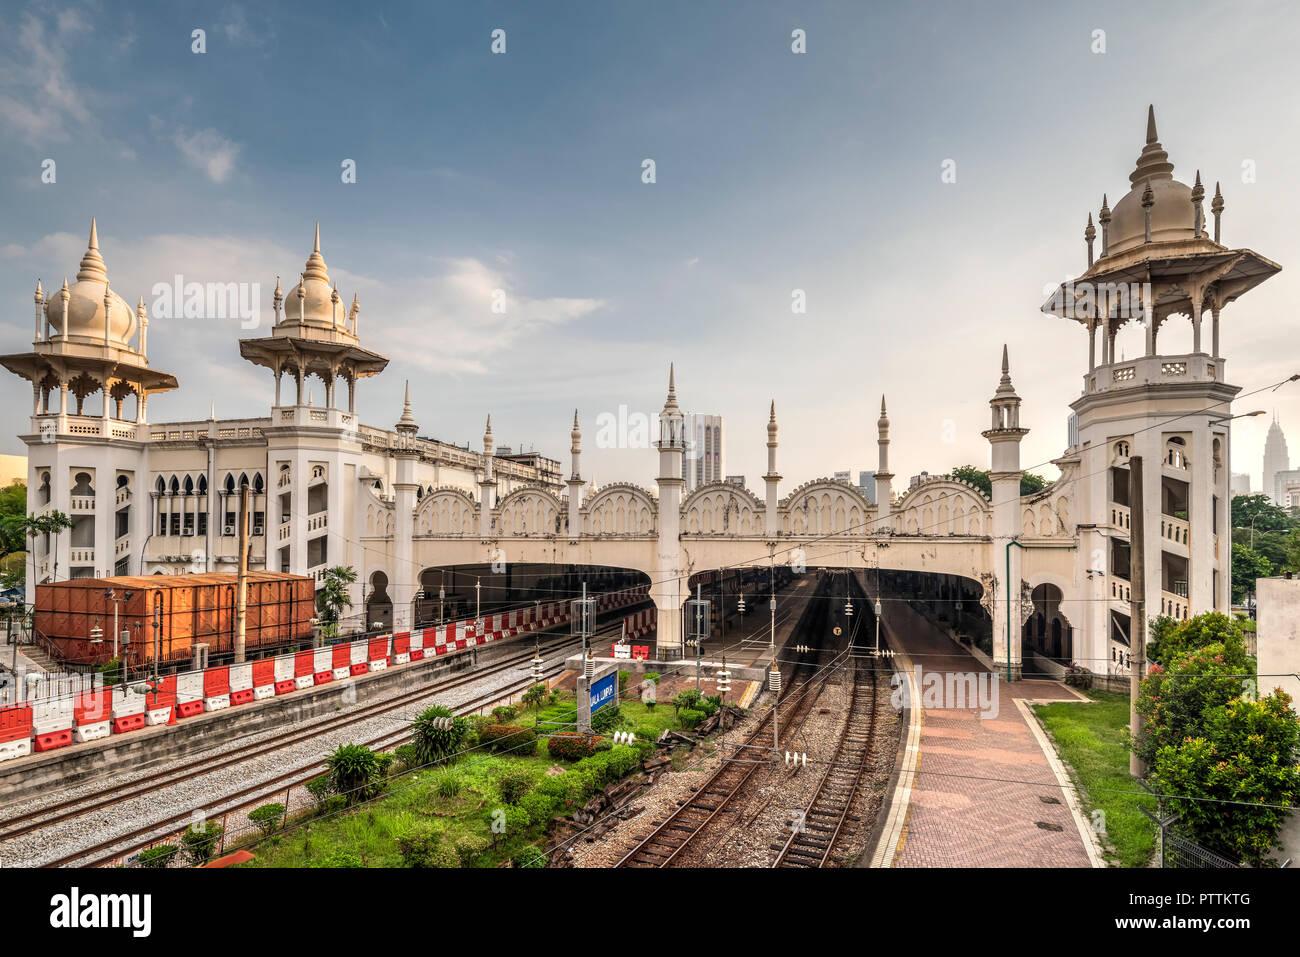 La gare de Kuala Lumpur, Kuala Lumpur, Malaisie Photo Stock